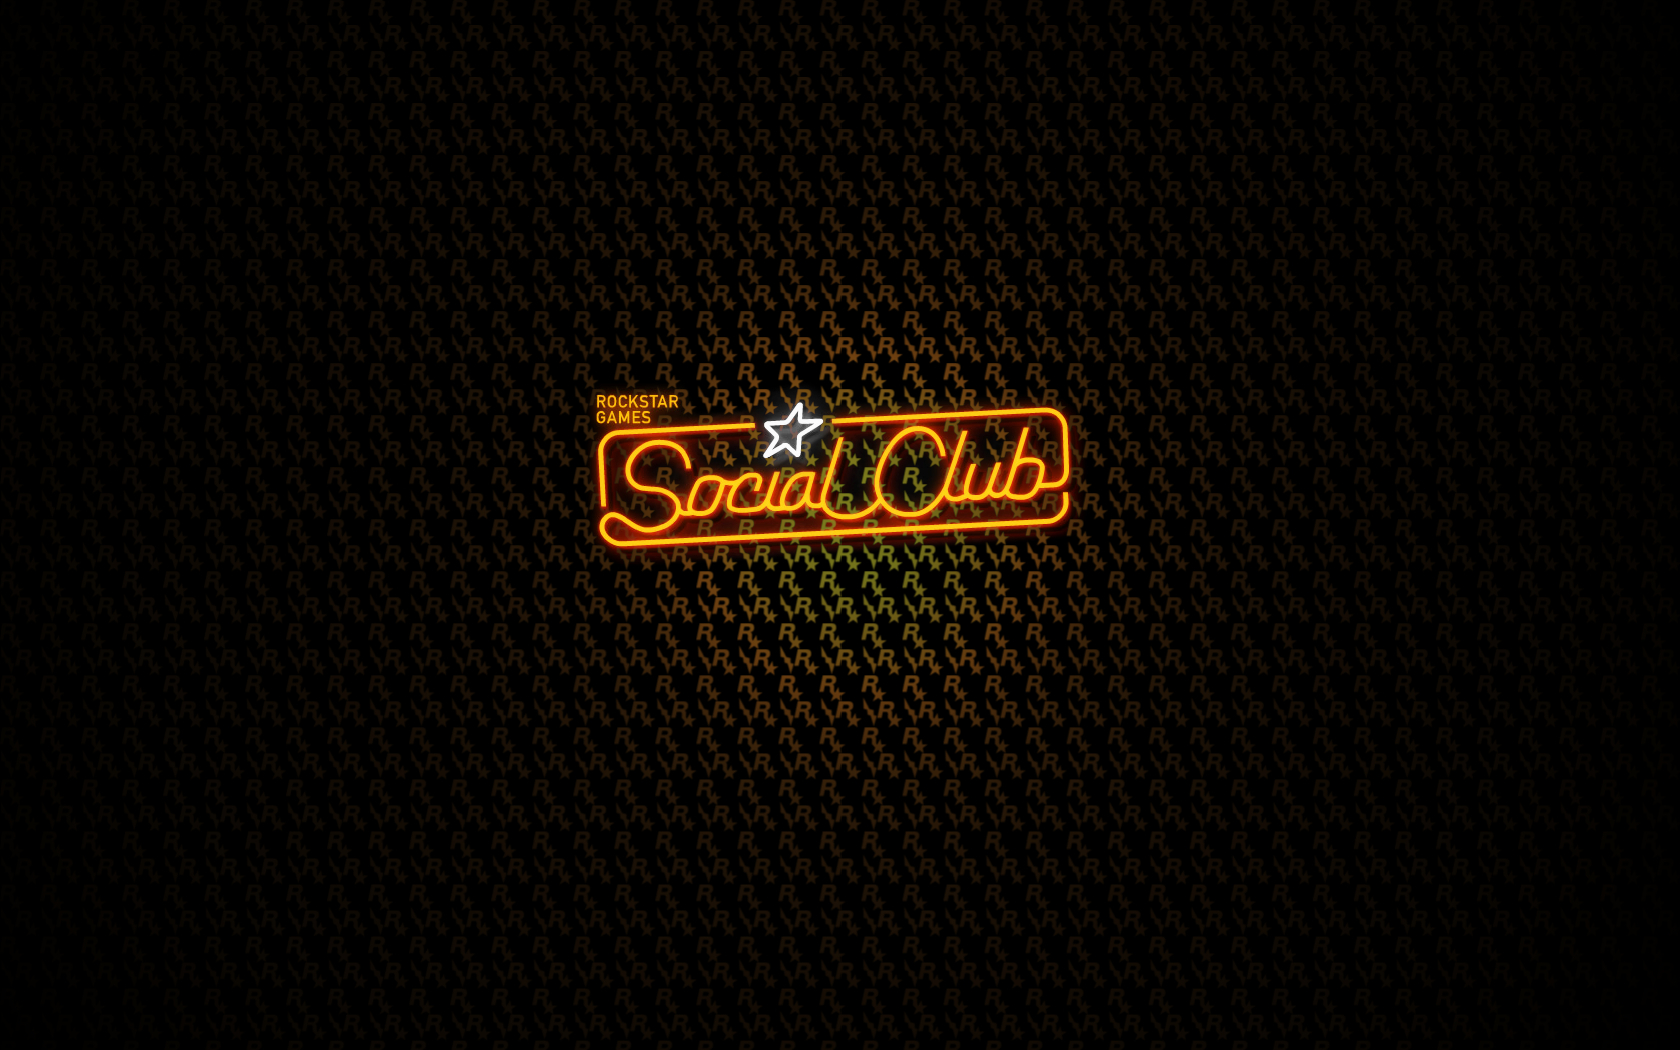 Rockstar Social Club Wall by An-D-Man333 on DeviantArt